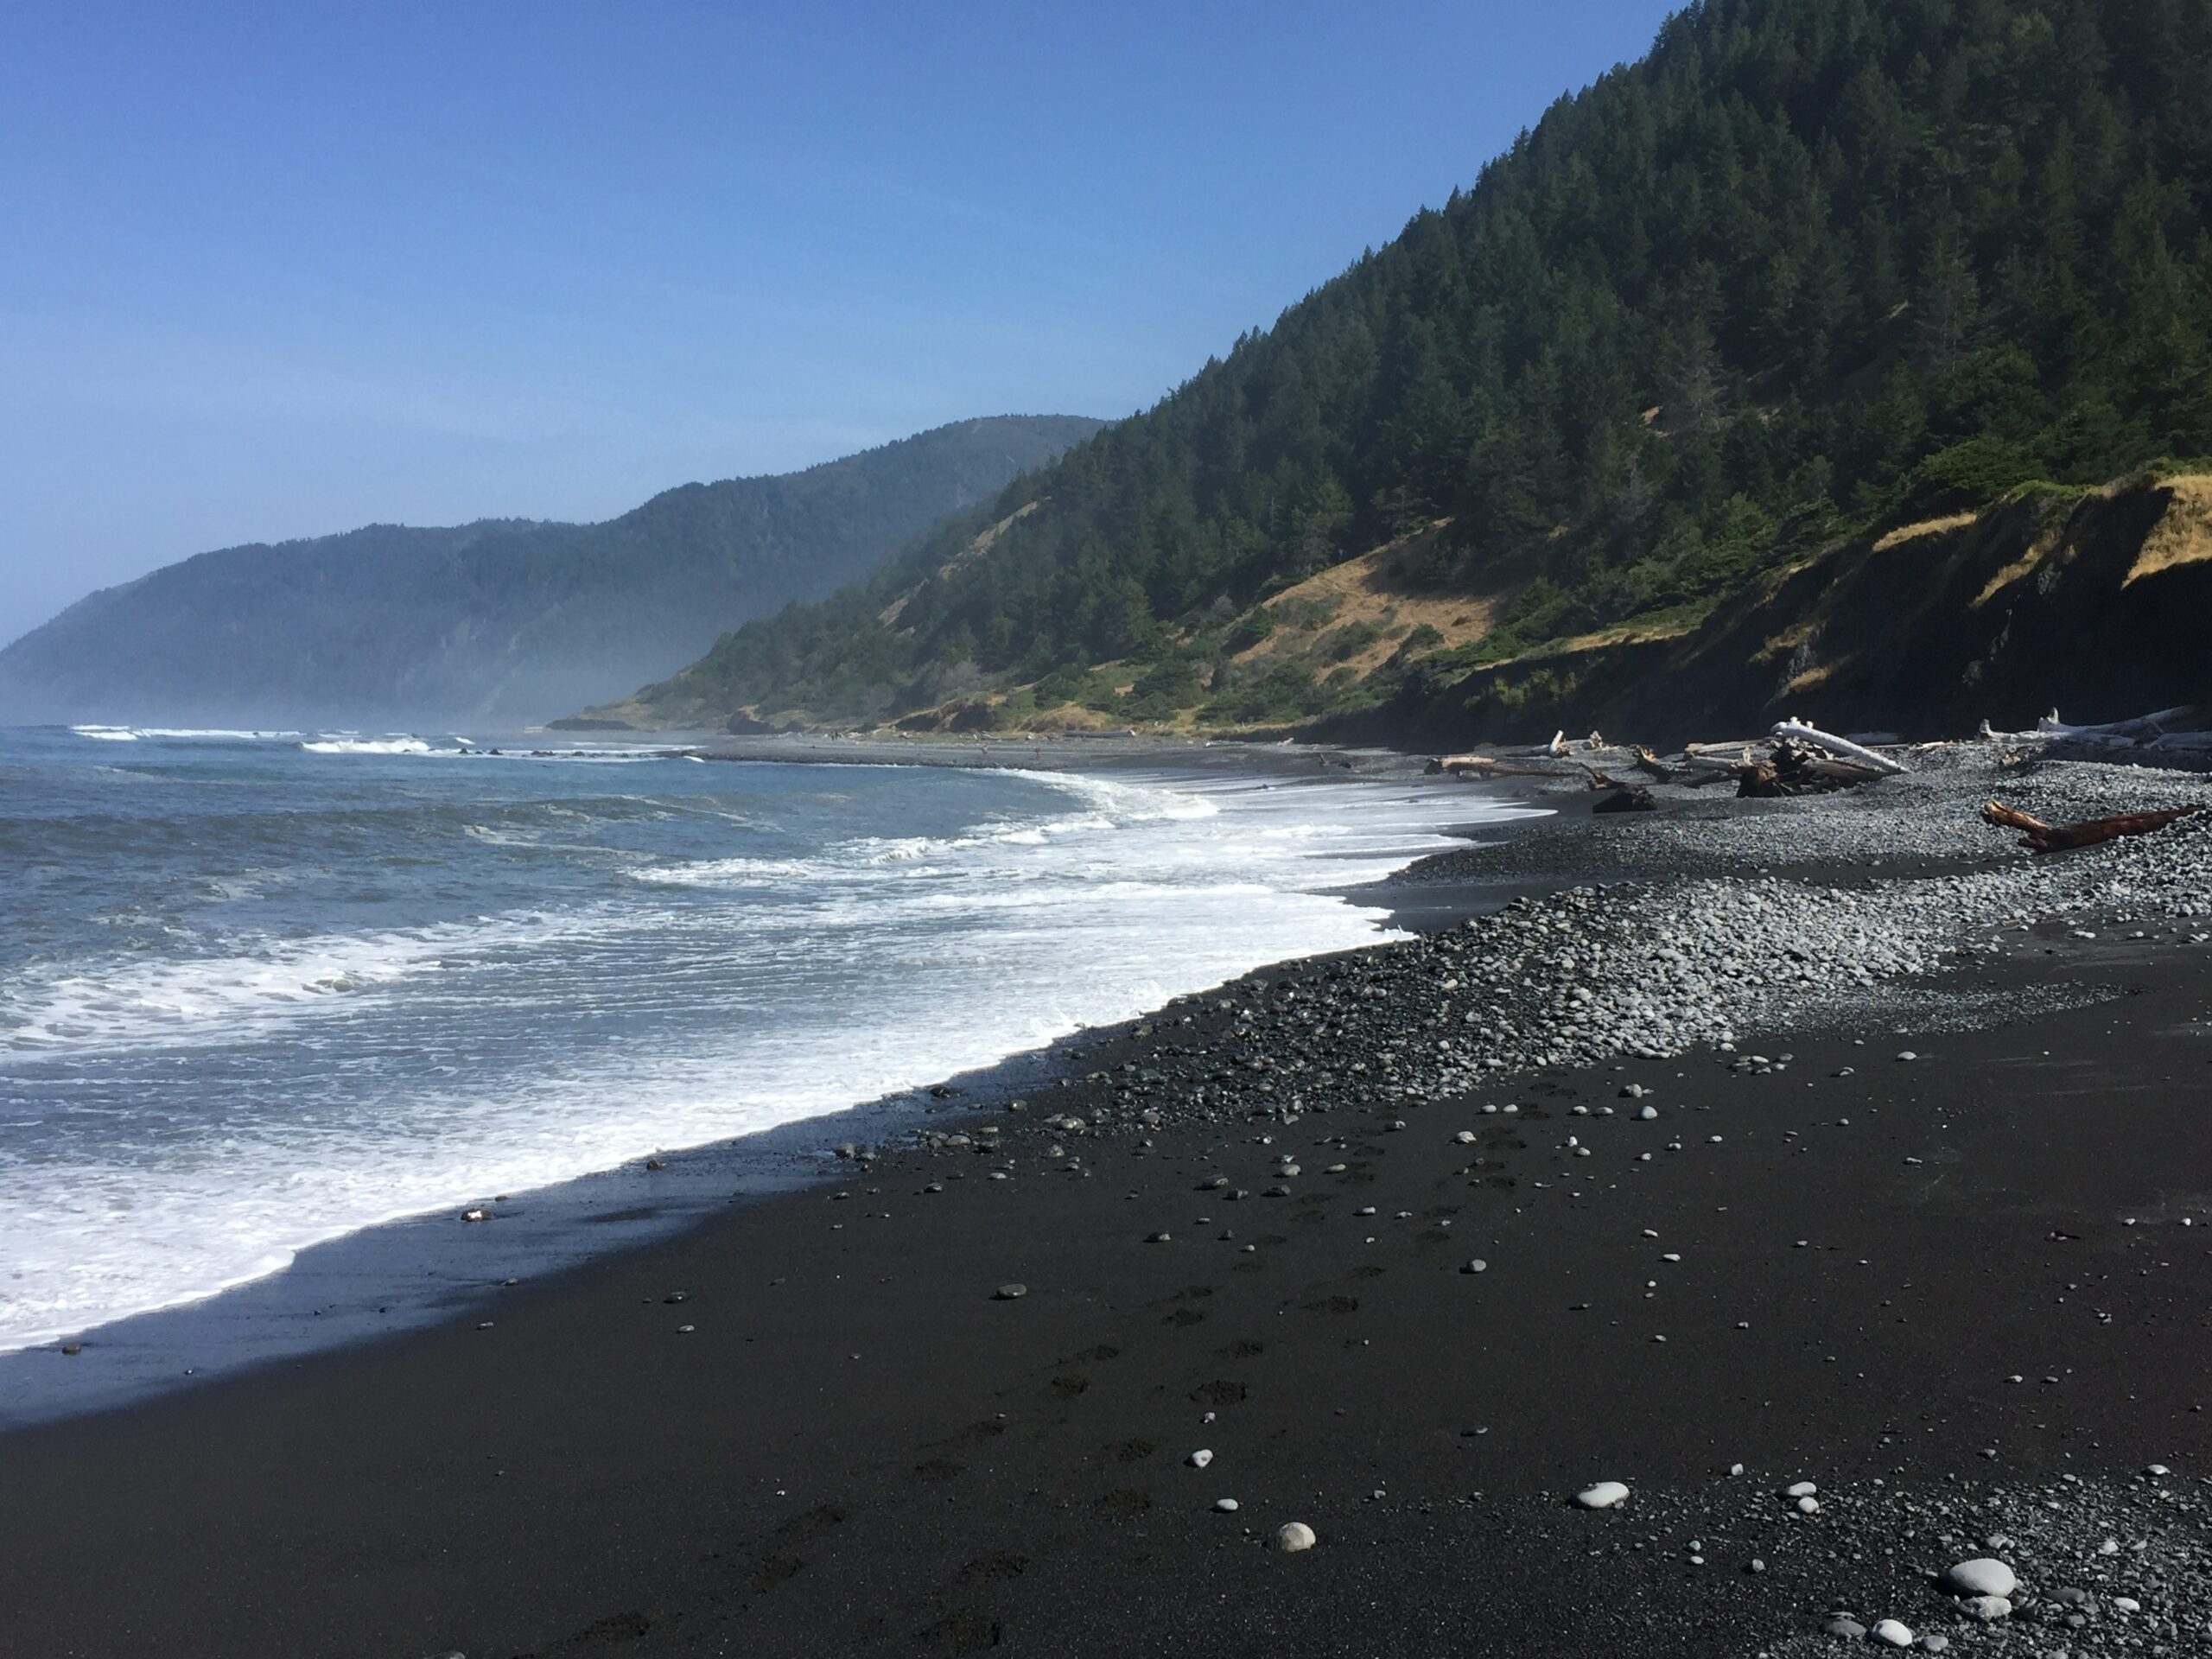 Black sand beach on the Lost Coast Trail